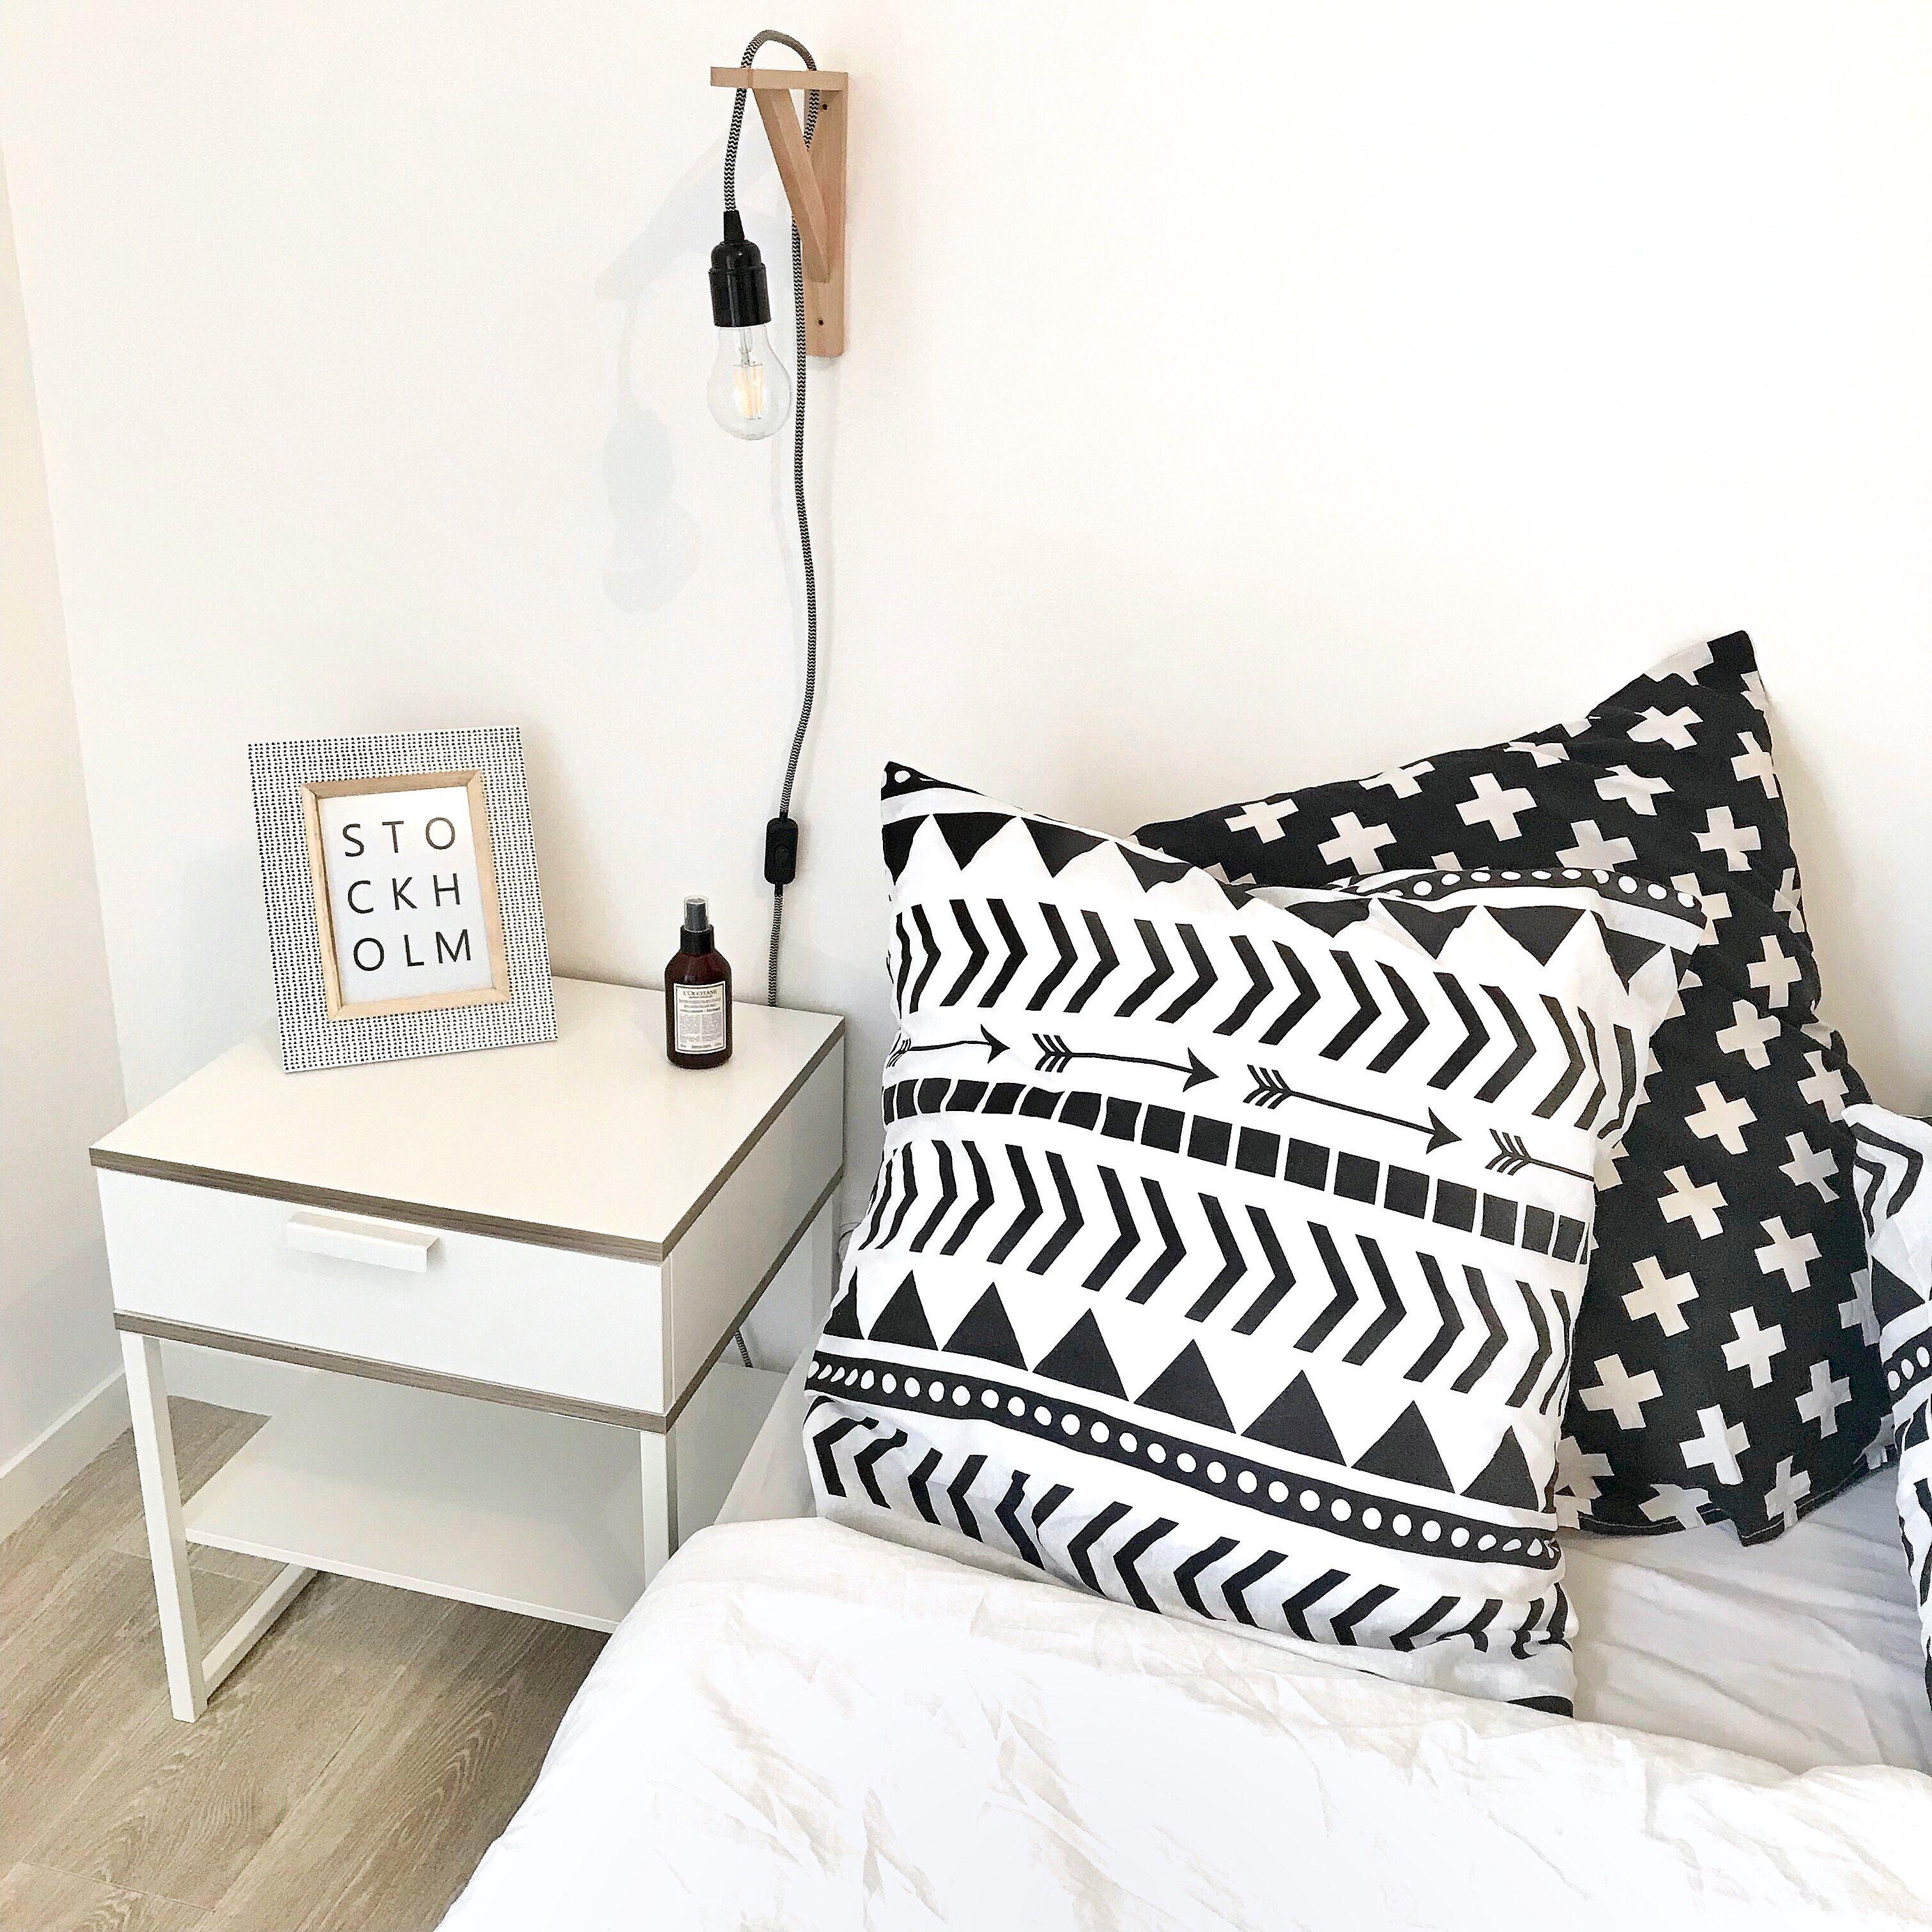 Home By Maud Appartment Decor Interior Design Bedroom Interior Design Living Room